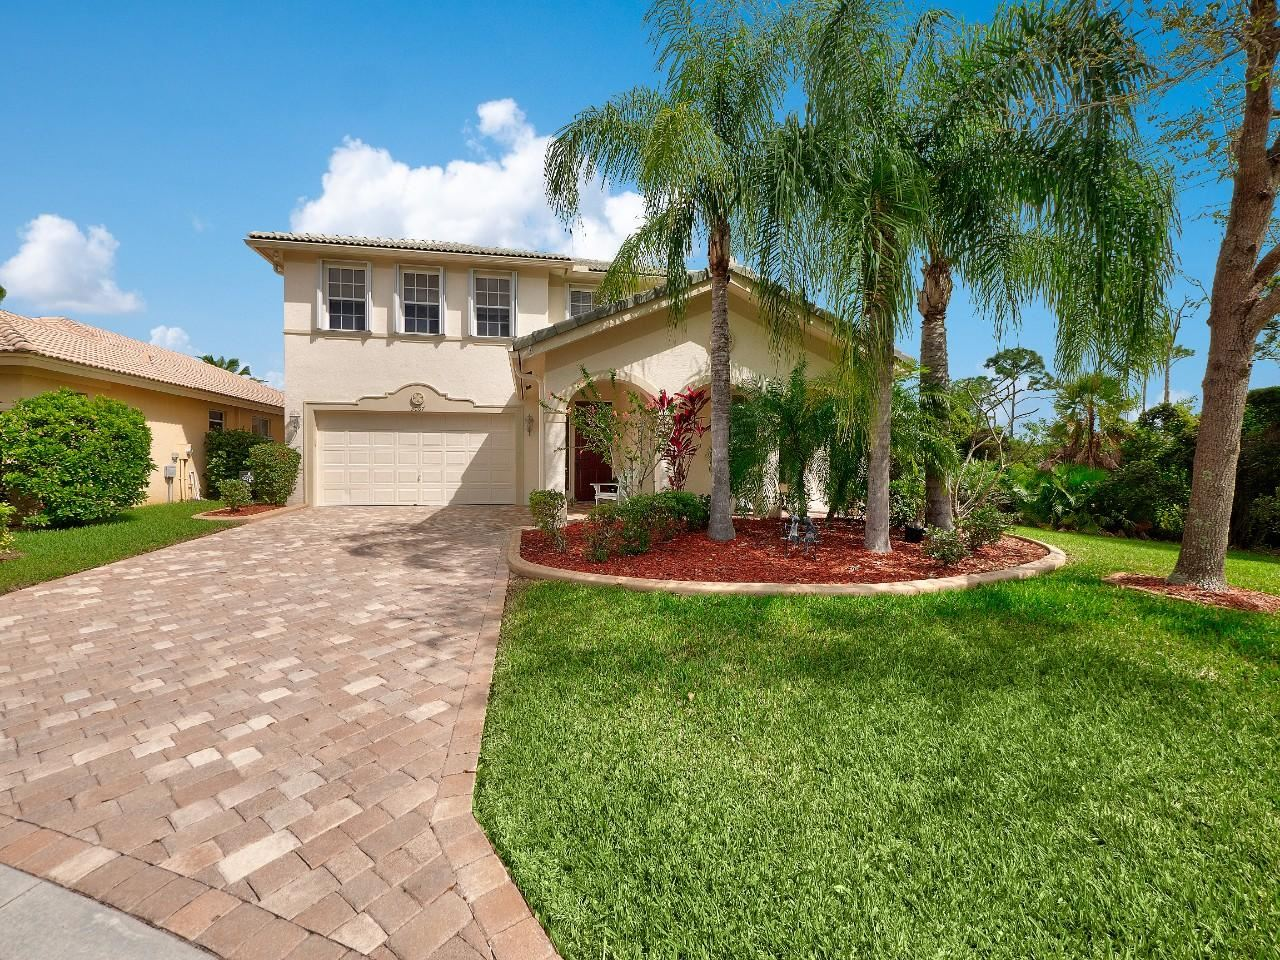 5067 SE Askew Avenue, Stuart, FL 34997 - #: RX-10694789